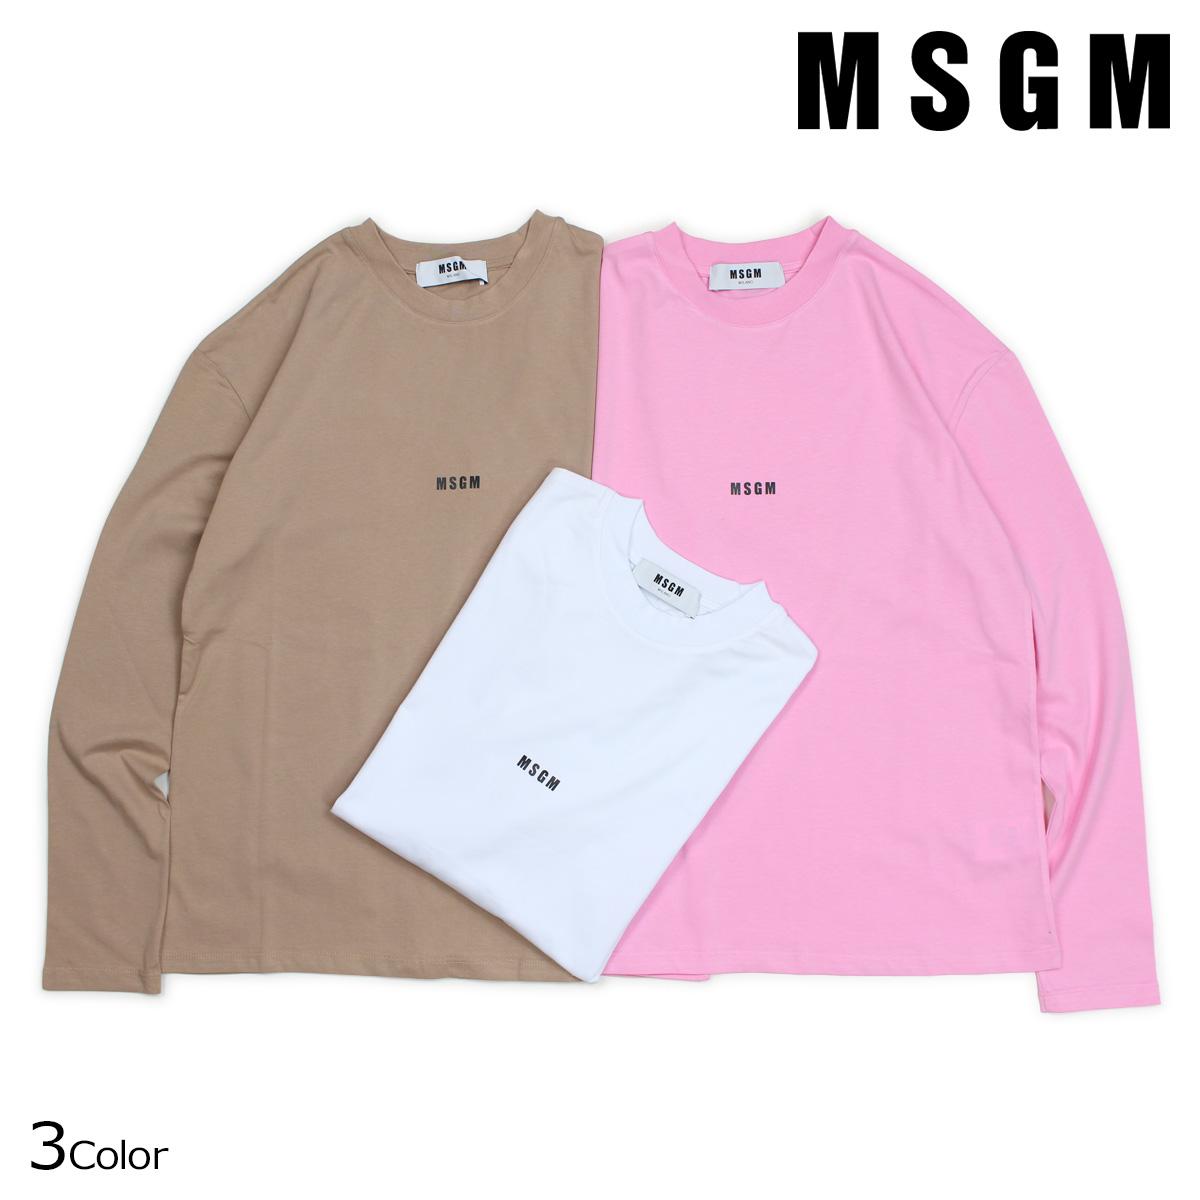 MSGM LOGO LONG SLEEVED SHIRTS WITH MICRO LOGO Tシャツ レディース エムエスジーエム 長袖 ロンT ホワイト ベージュ ピンク 2541MDM101 184798